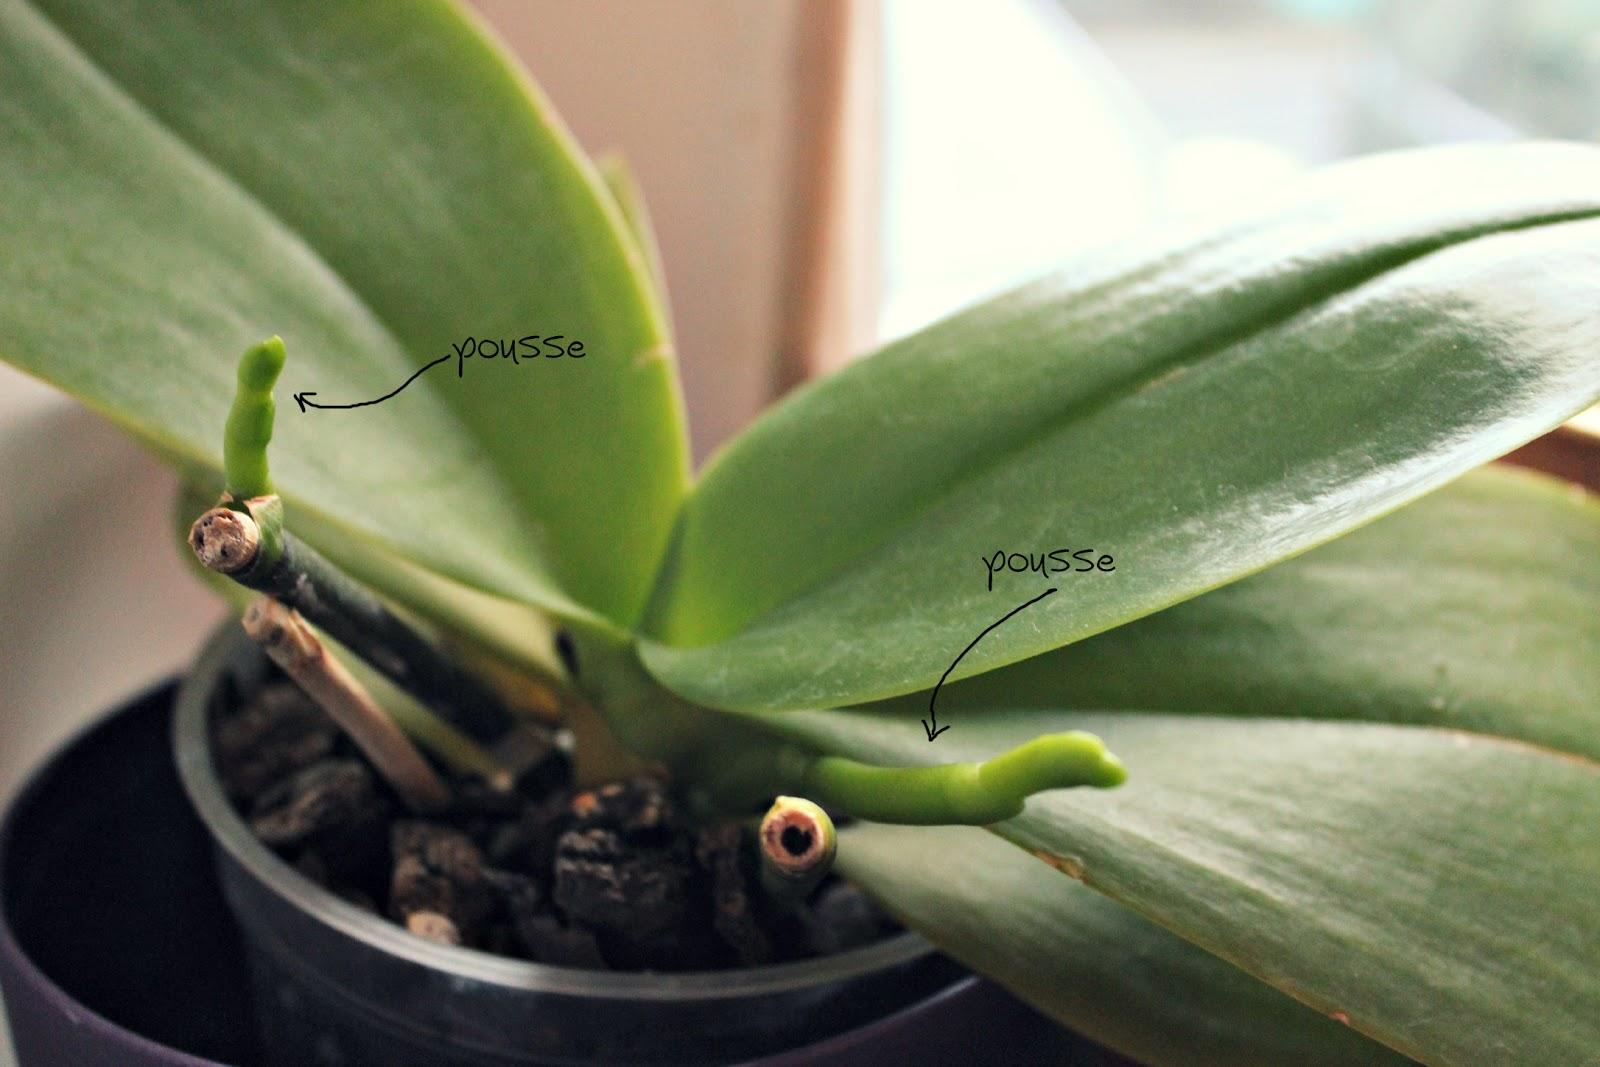 sugar dinosaurs mes orchid es leur routine petits conseils de tata sugar dinosaurs. Black Bedroom Furniture Sets. Home Design Ideas